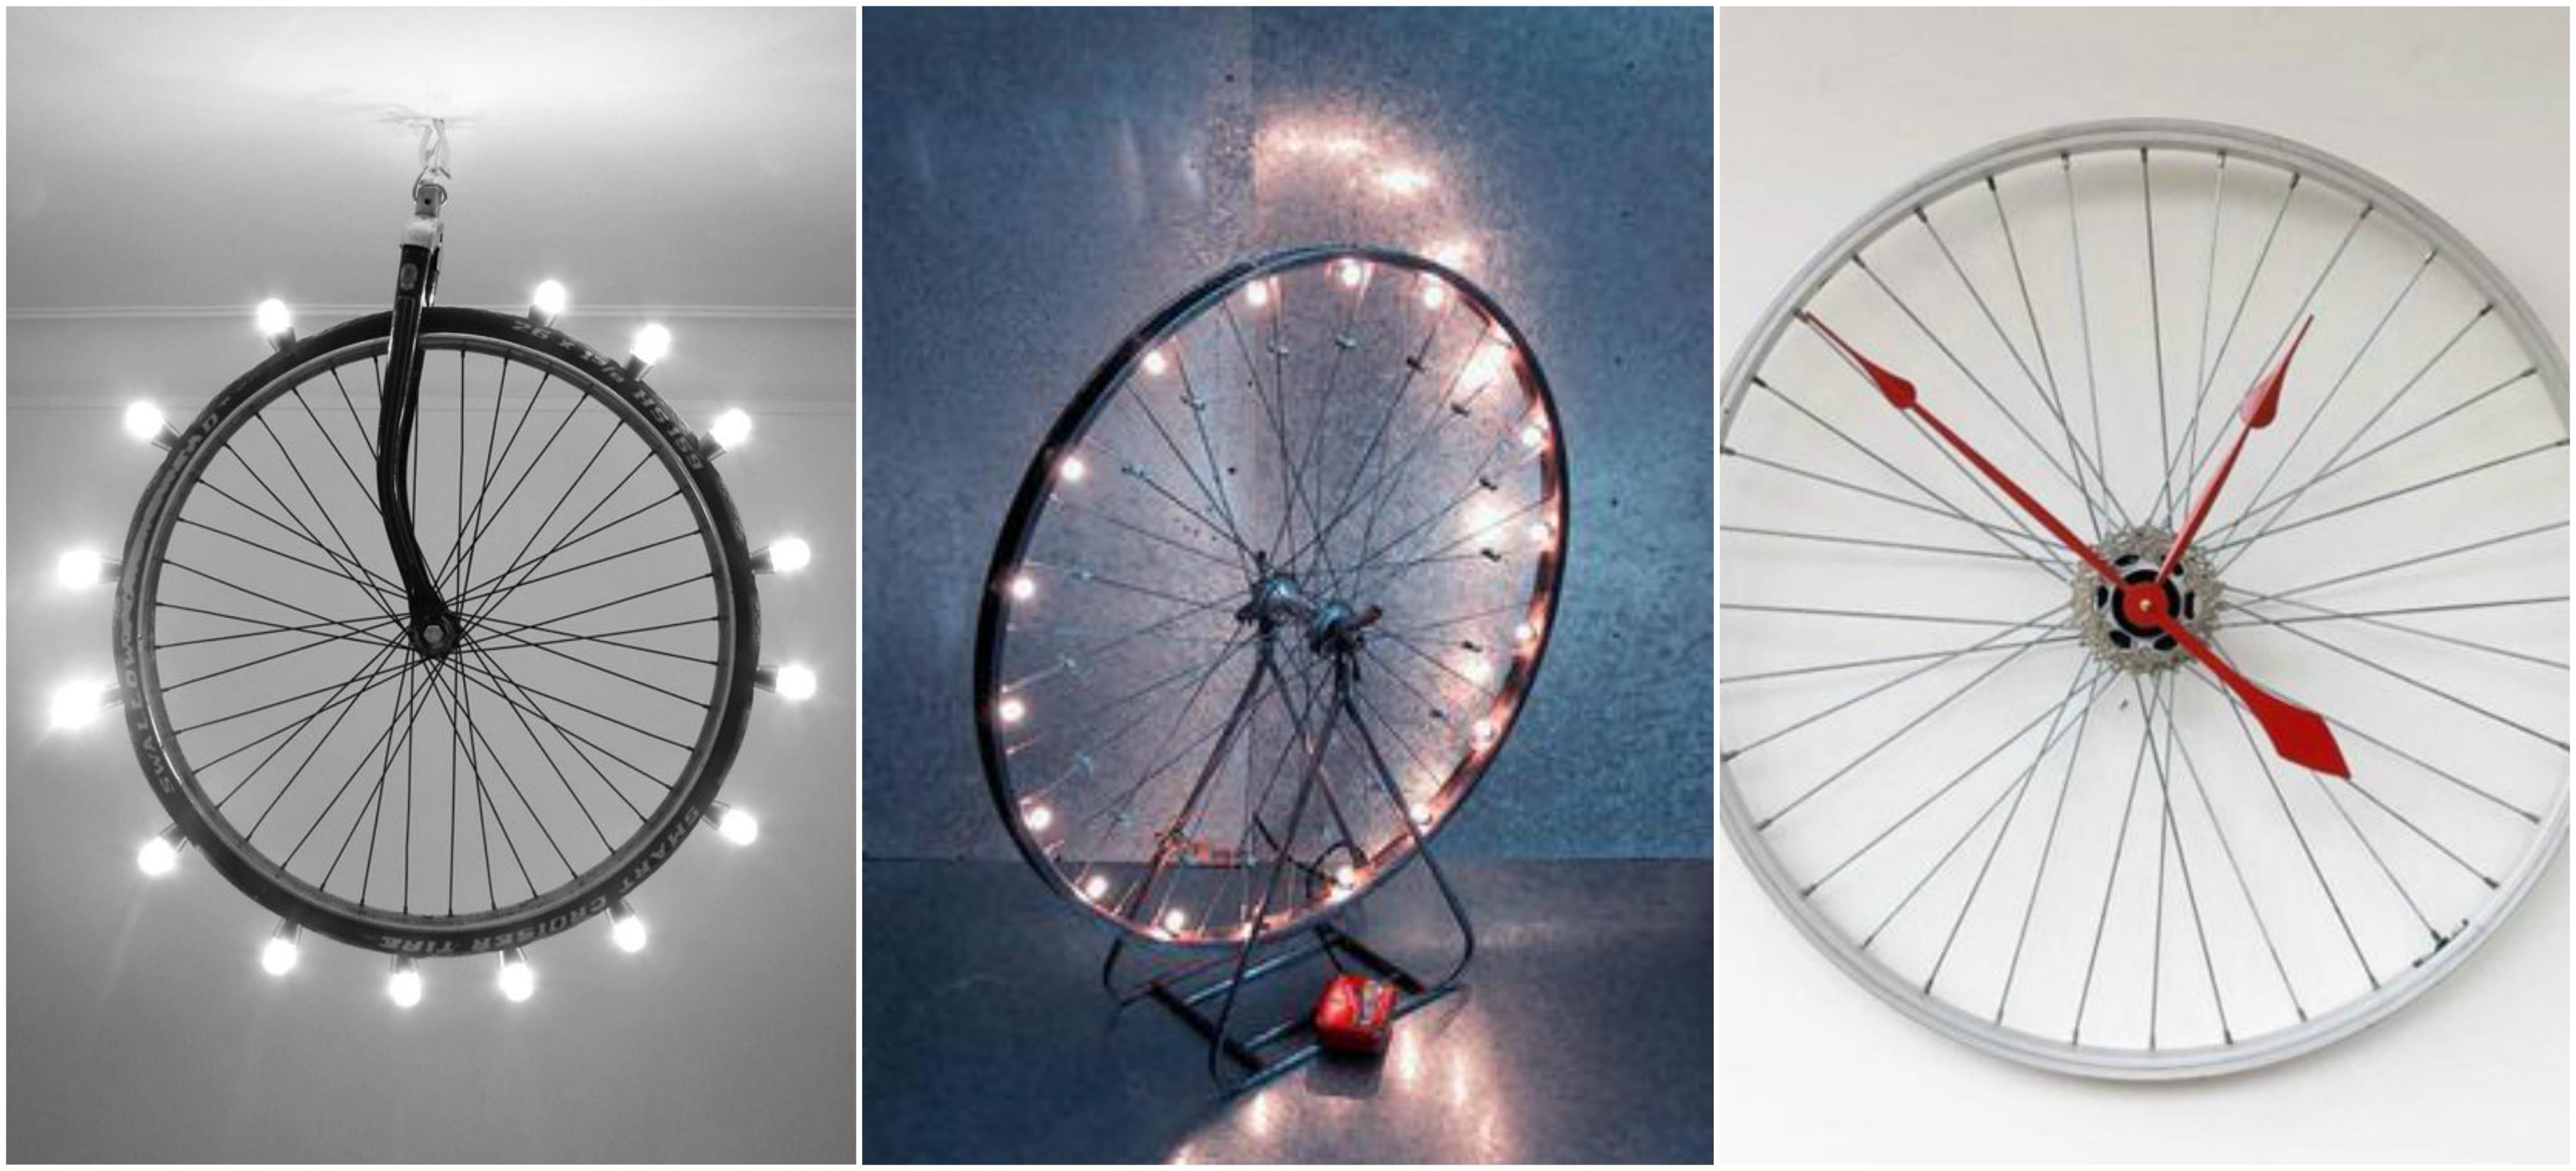 10 upcycling ideen mit fahrradteilen. Black Bedroom Furniture Sets. Home Design Ideas